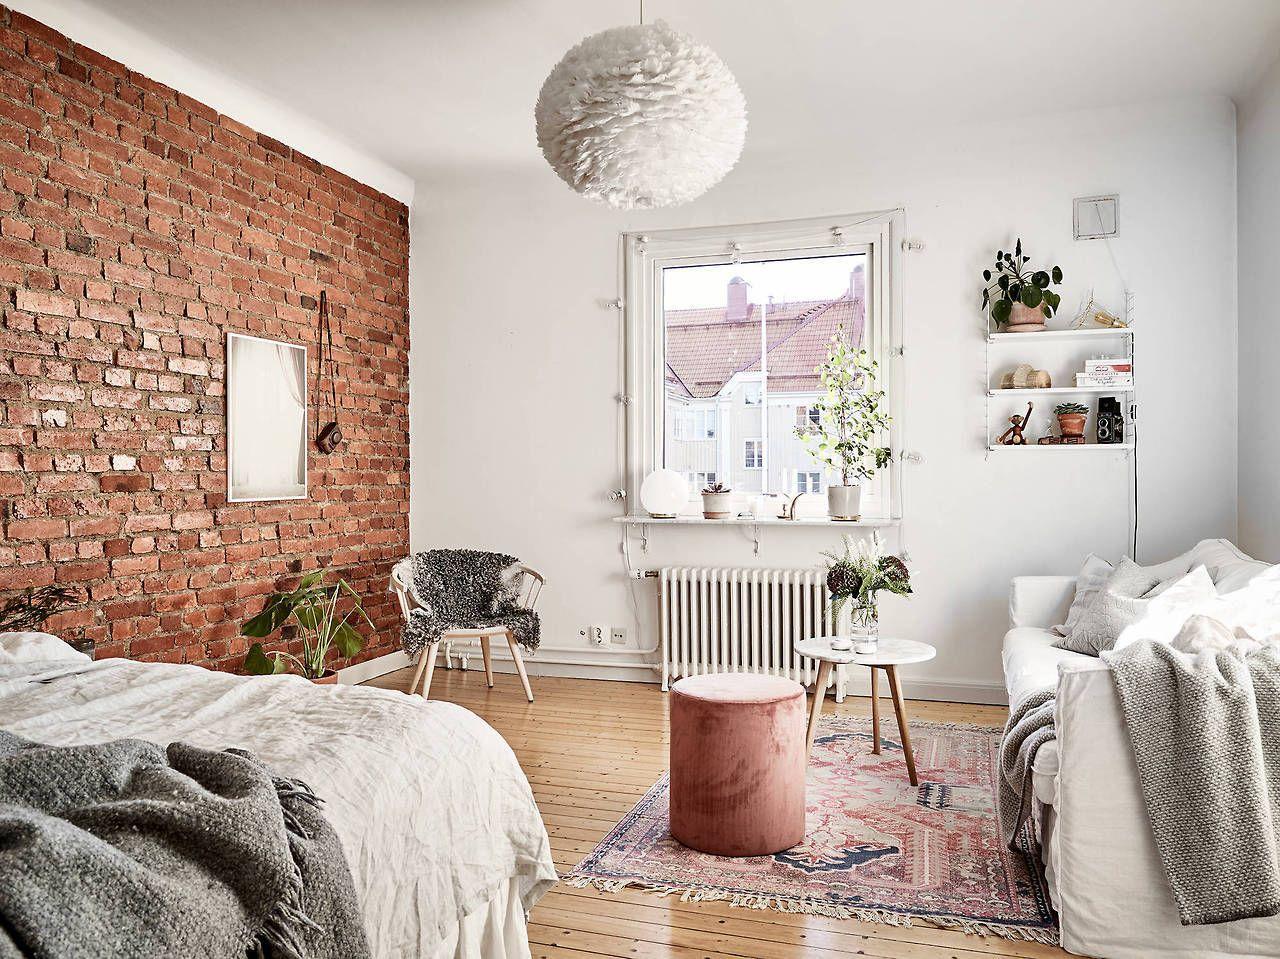 Studio Apartment With Exposed Brick Wall I Love Studios